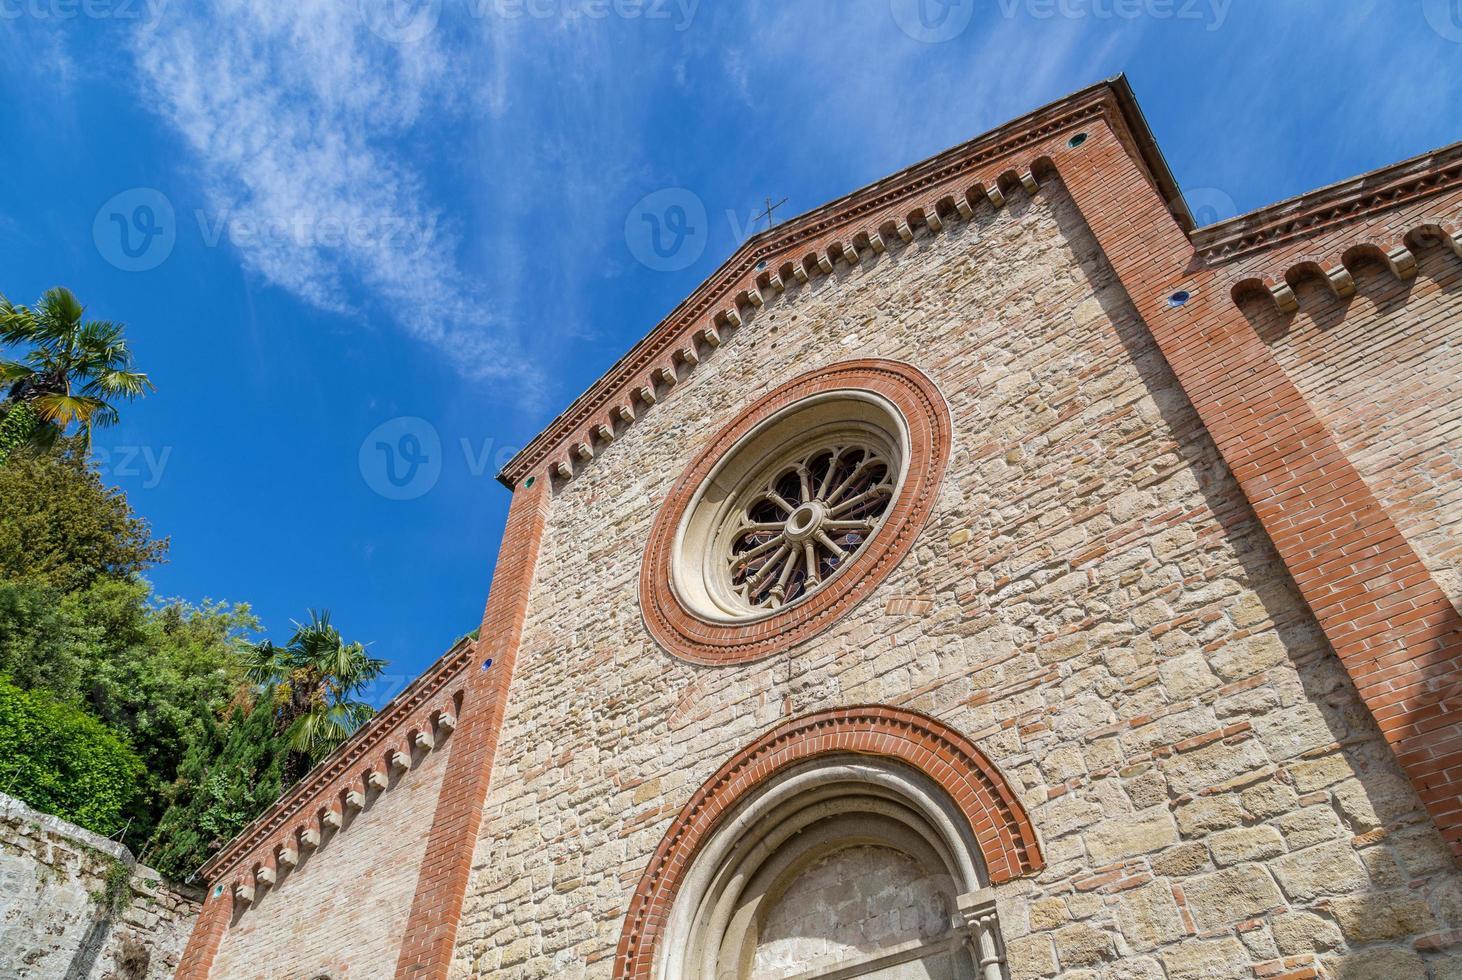 Facade of XIV Catholics parish church in Italy photo